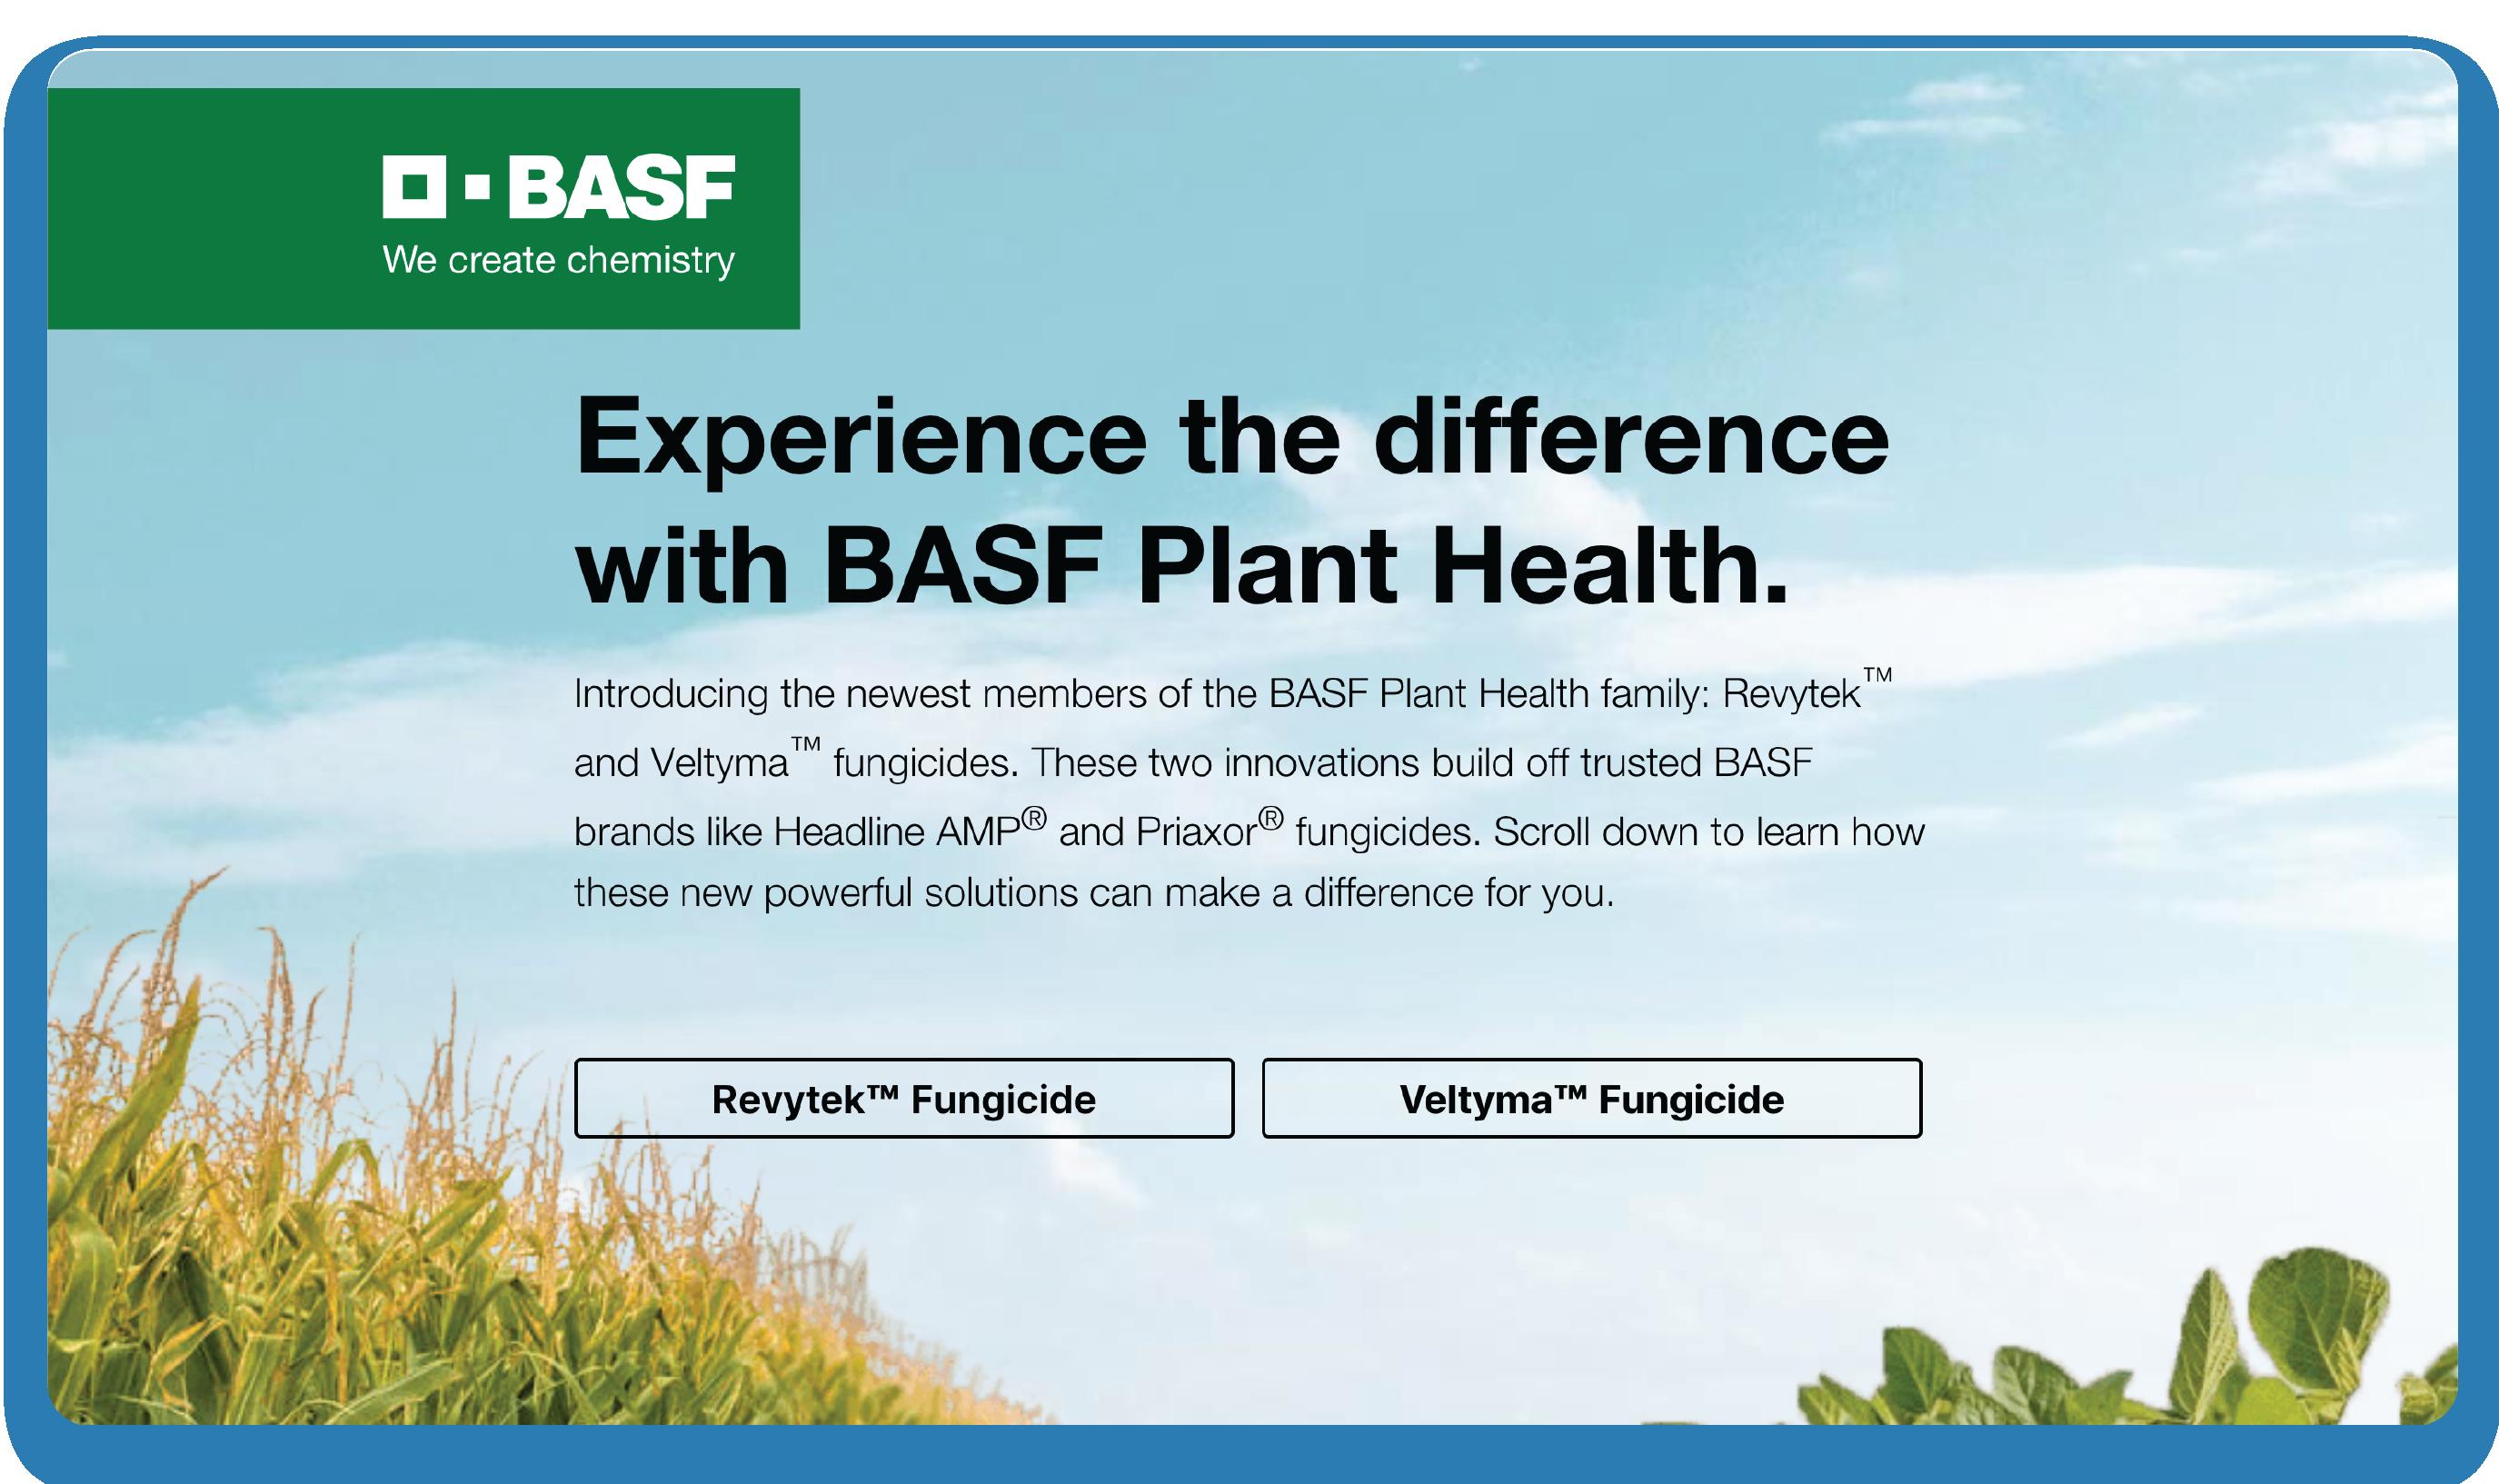 BASF case study 2